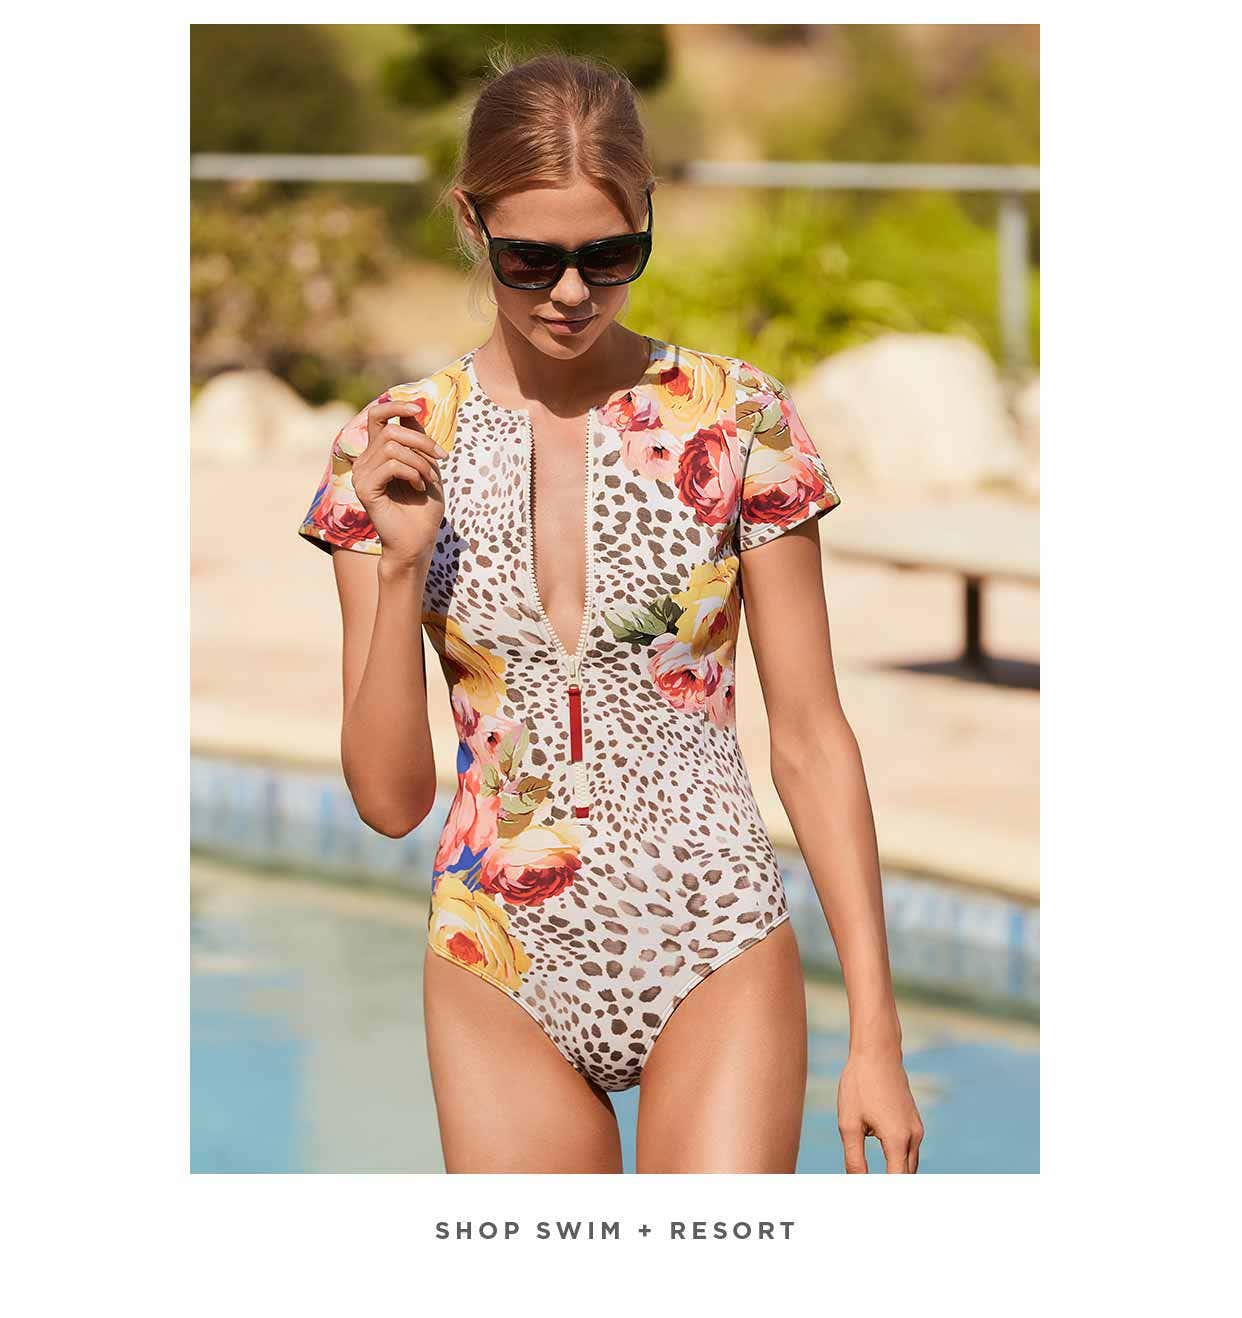 Shop Swim + Resort